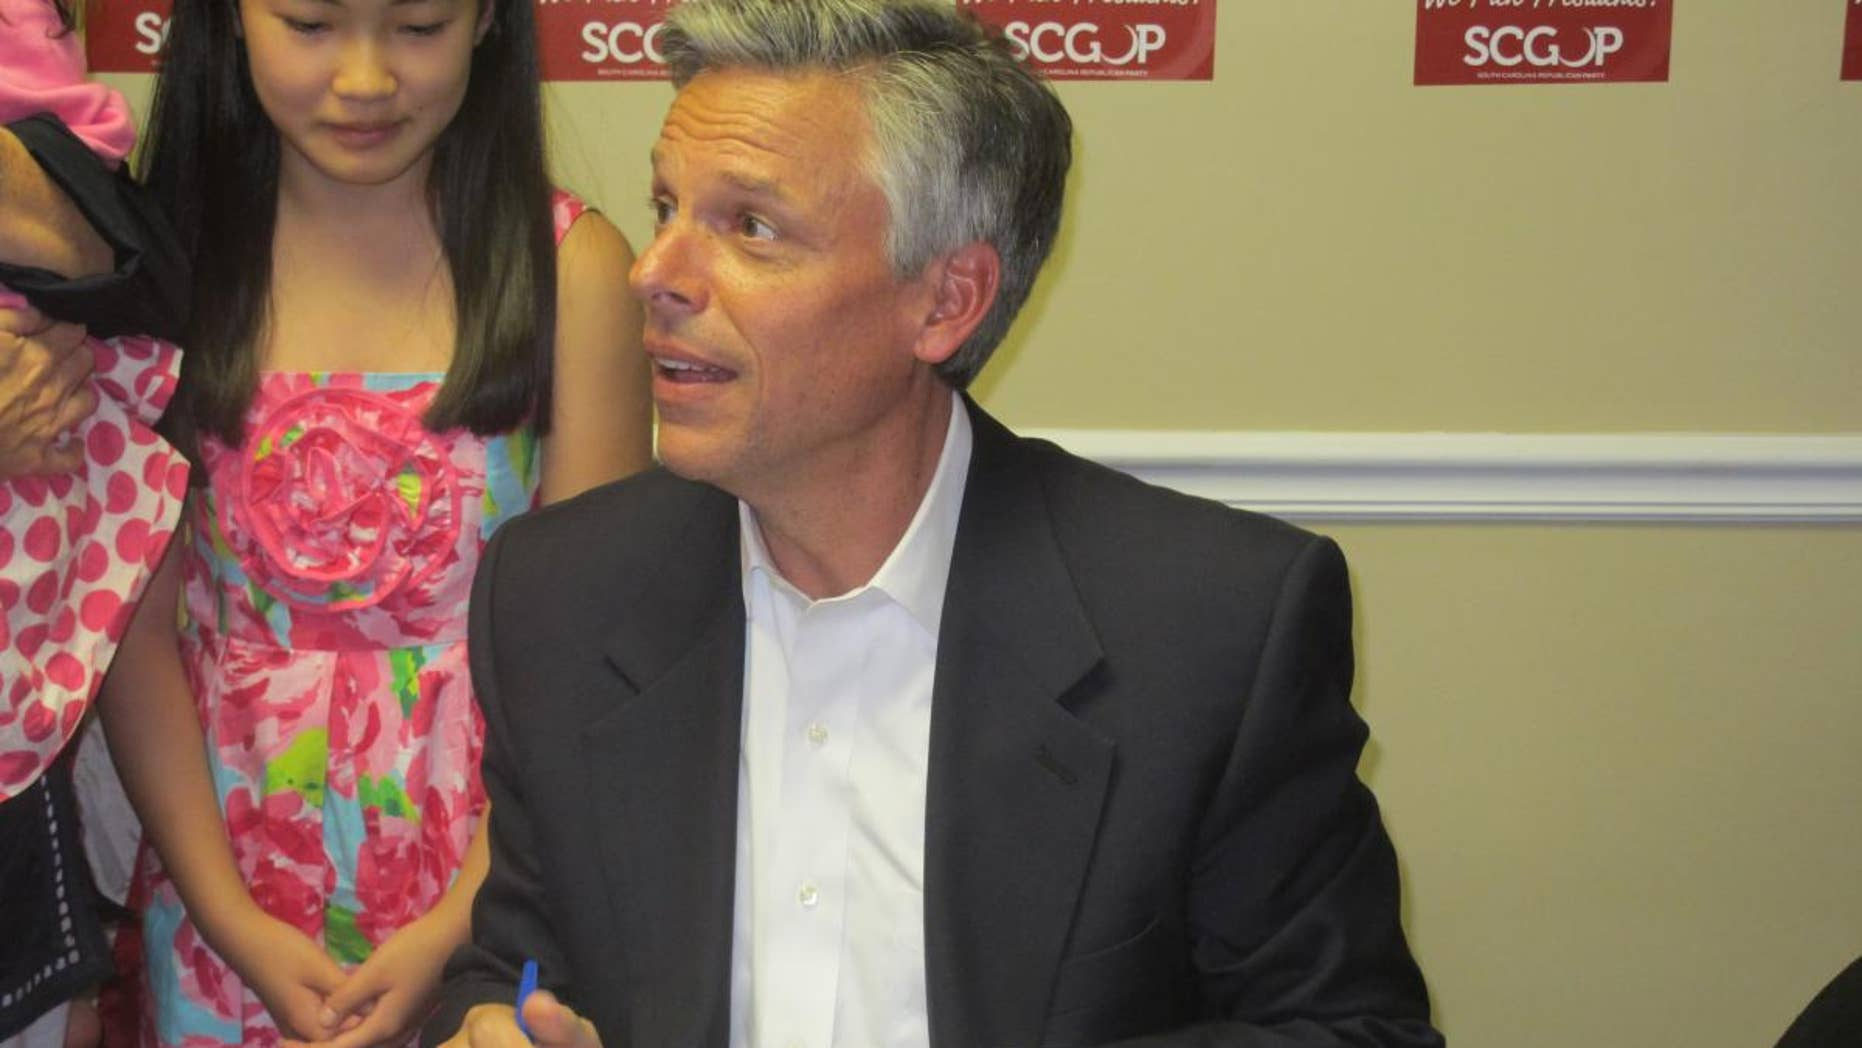 Former Utah Governor Jon Huntsman entered the South Carolina Primary Wednesday  (Fox News Photo)